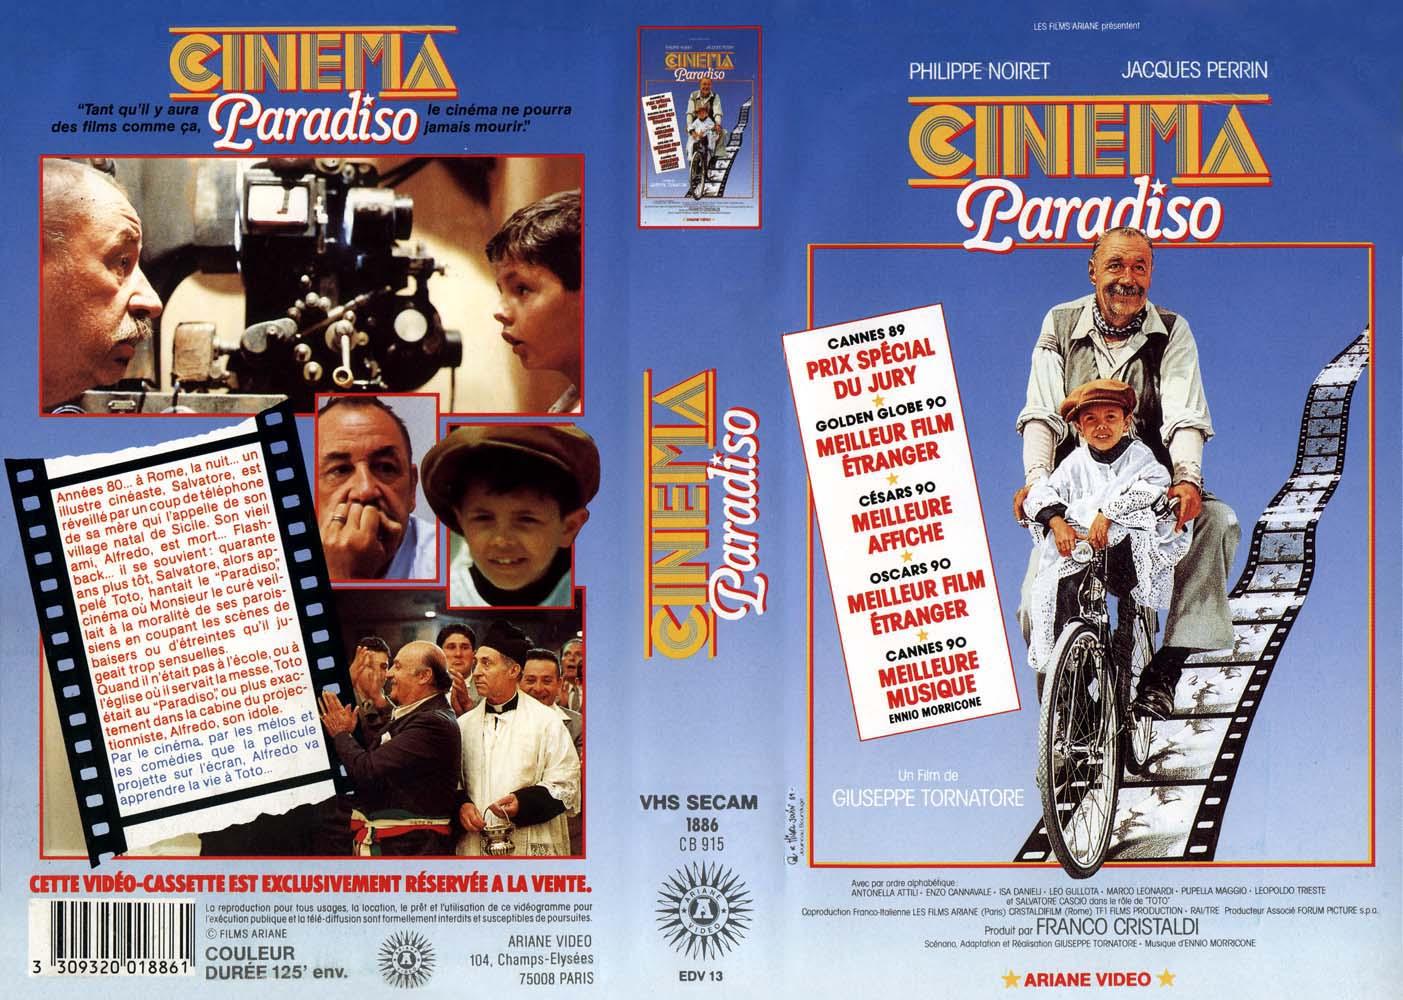 a plot analysis of the film cinema paradiso by giuseppe tornatore